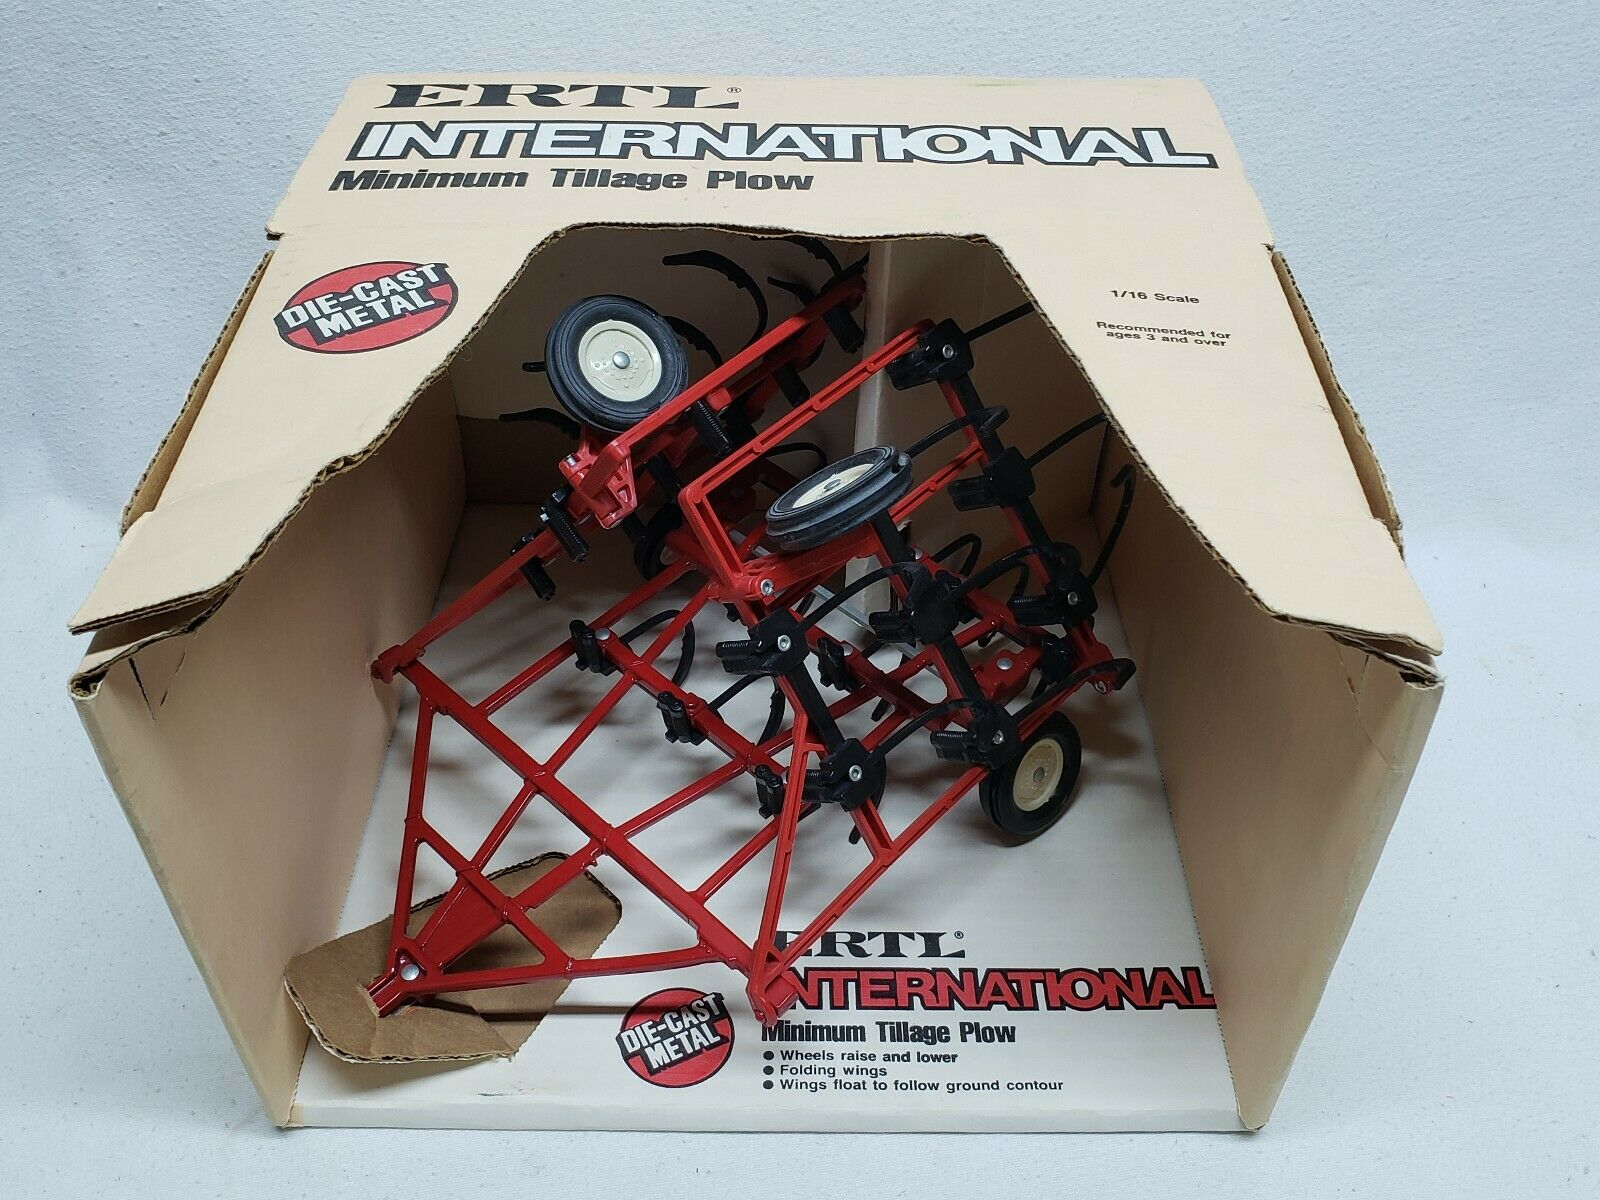 Vintage ERTL International IH Minimum Tillage Plow 1 16 Farm Toy Tractor NIB